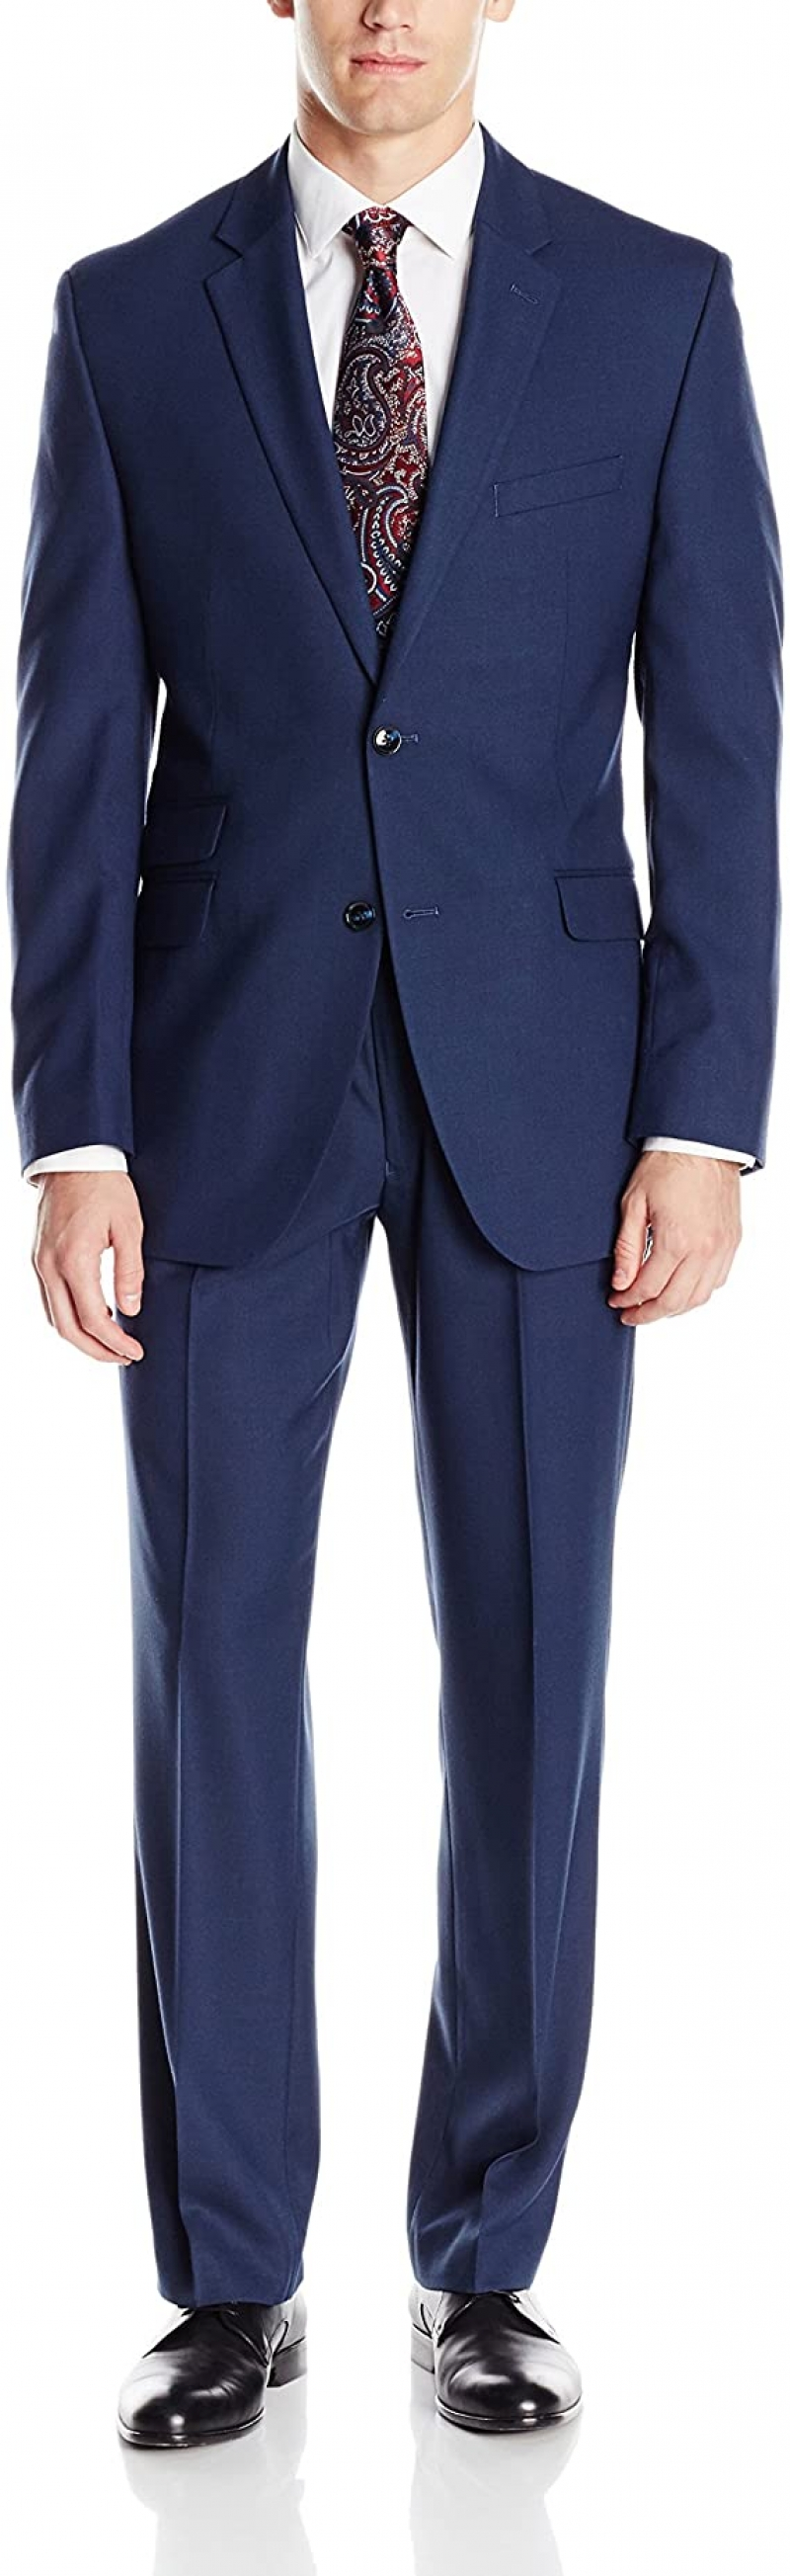 ihocon: Perry Ellis Men's Slim Fit Suit with Hemmed Pant 男士西服一套